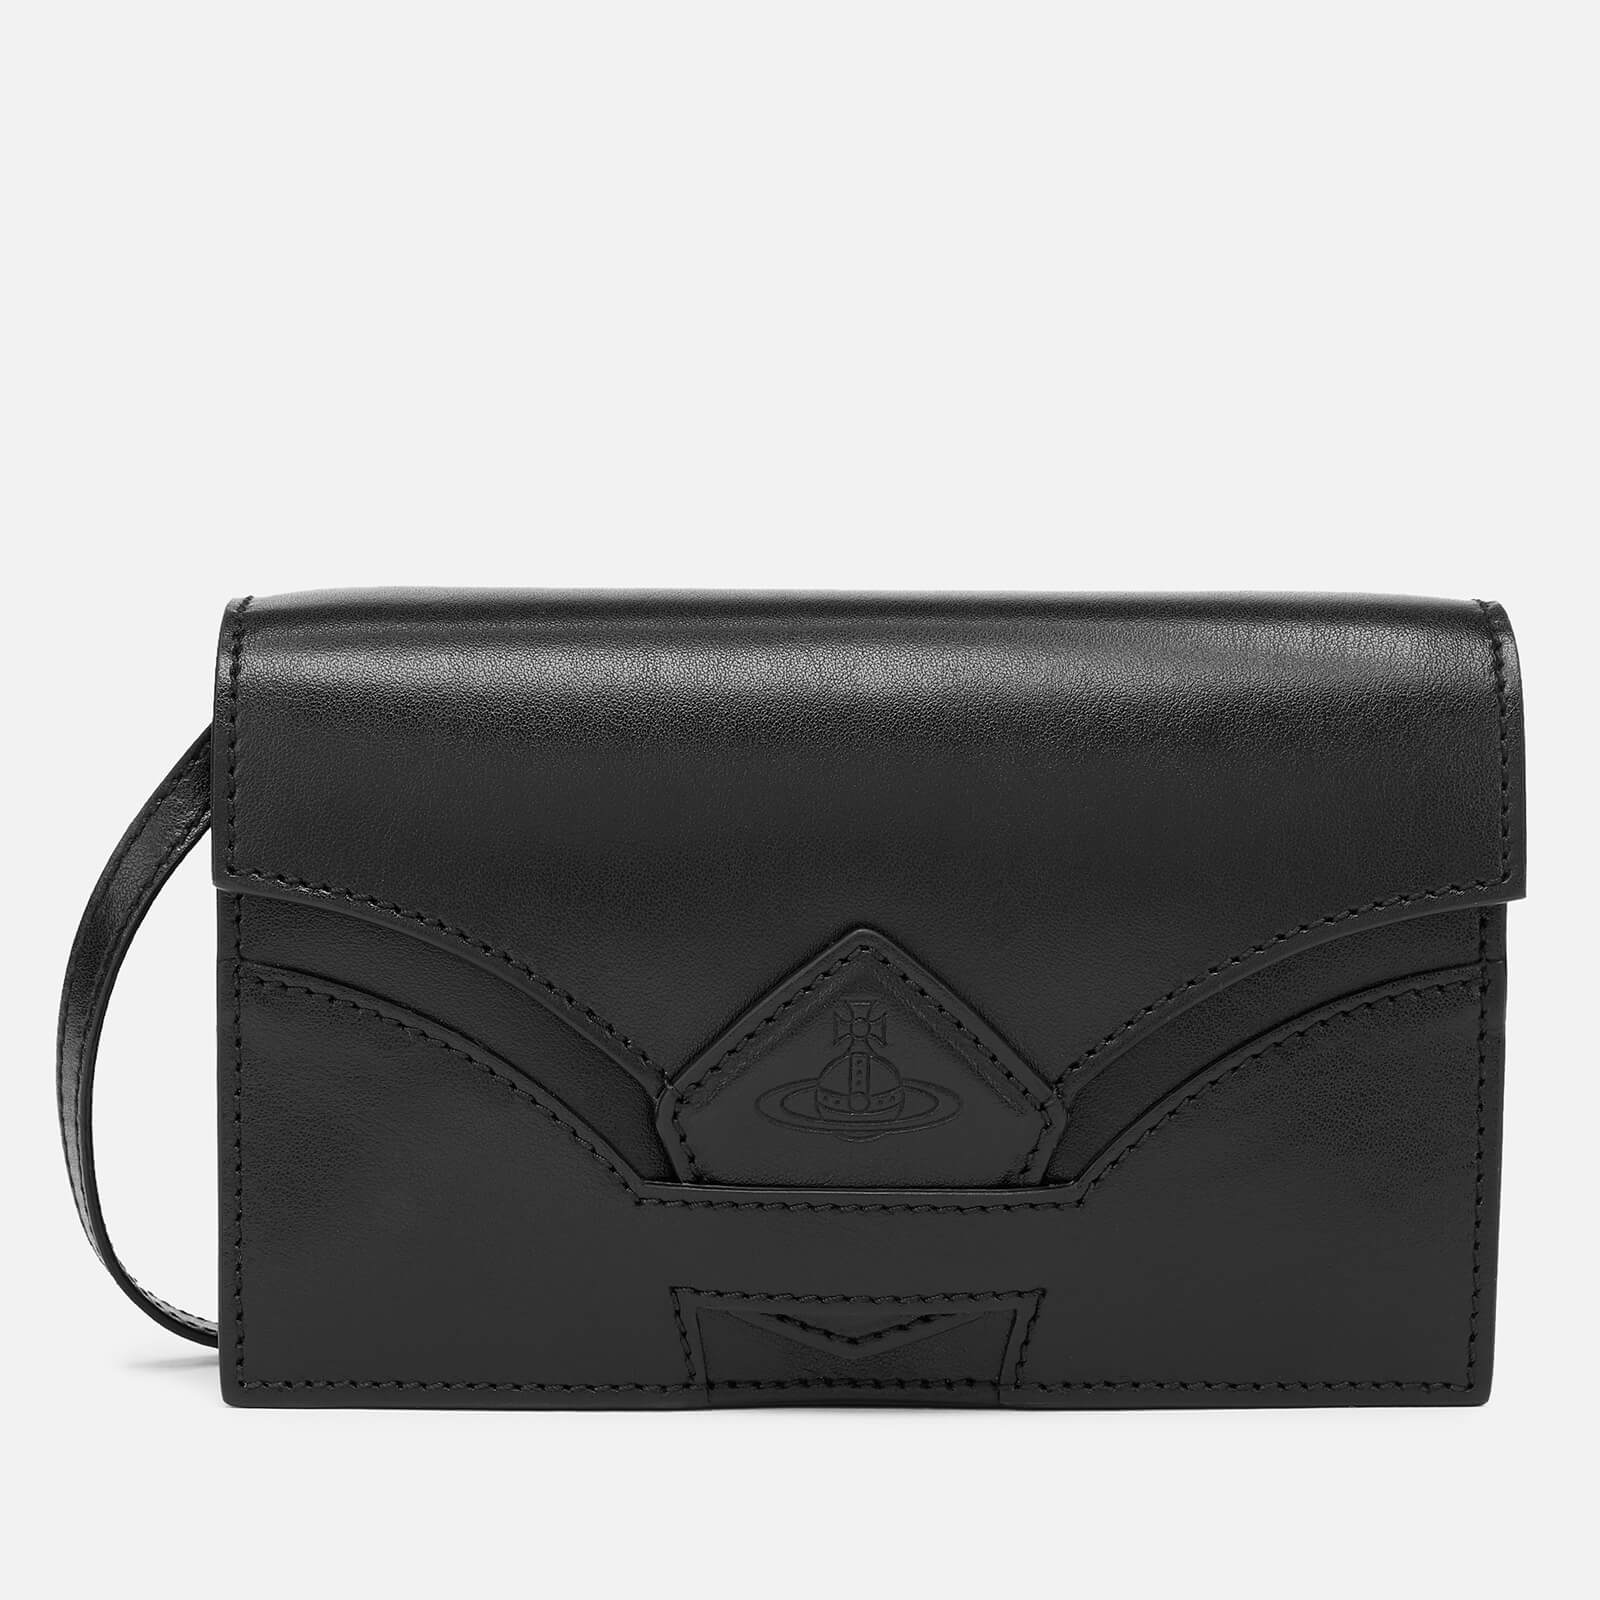 Vivienne Westwood Women S Rosie Small Cross Body Bag Black